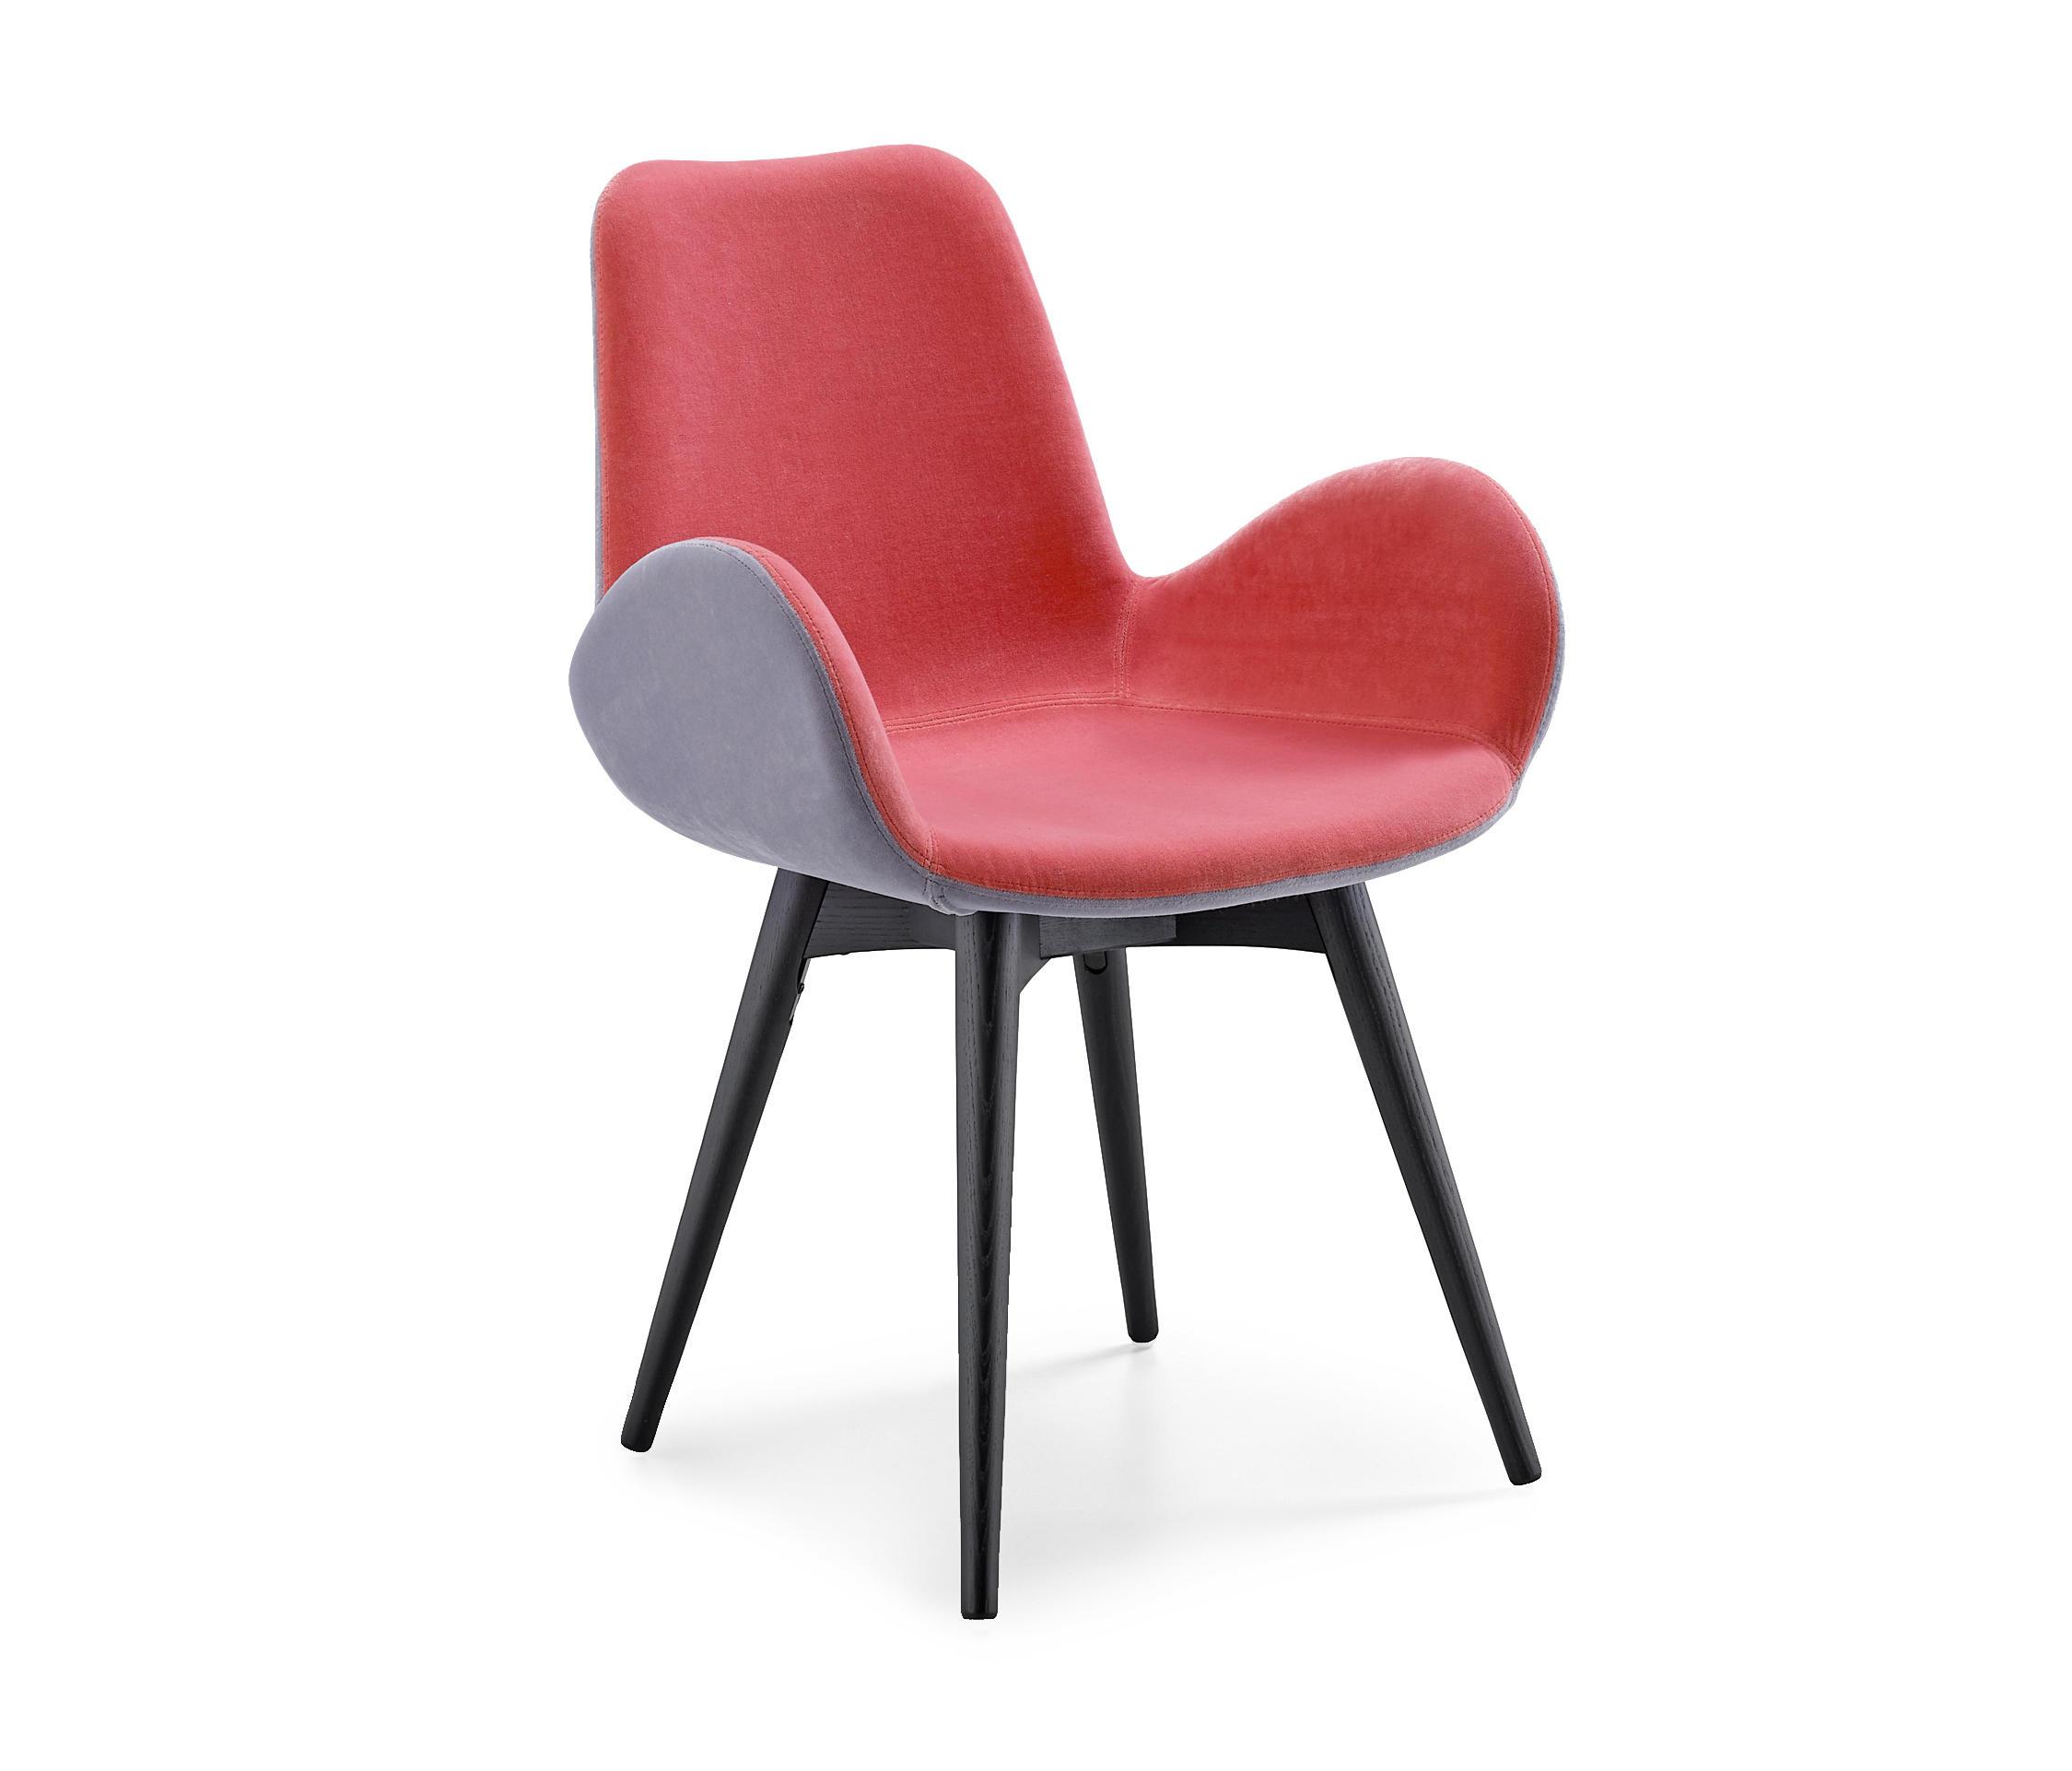 DALIA PB LG - Restaurant chairs from Midj | Architonic